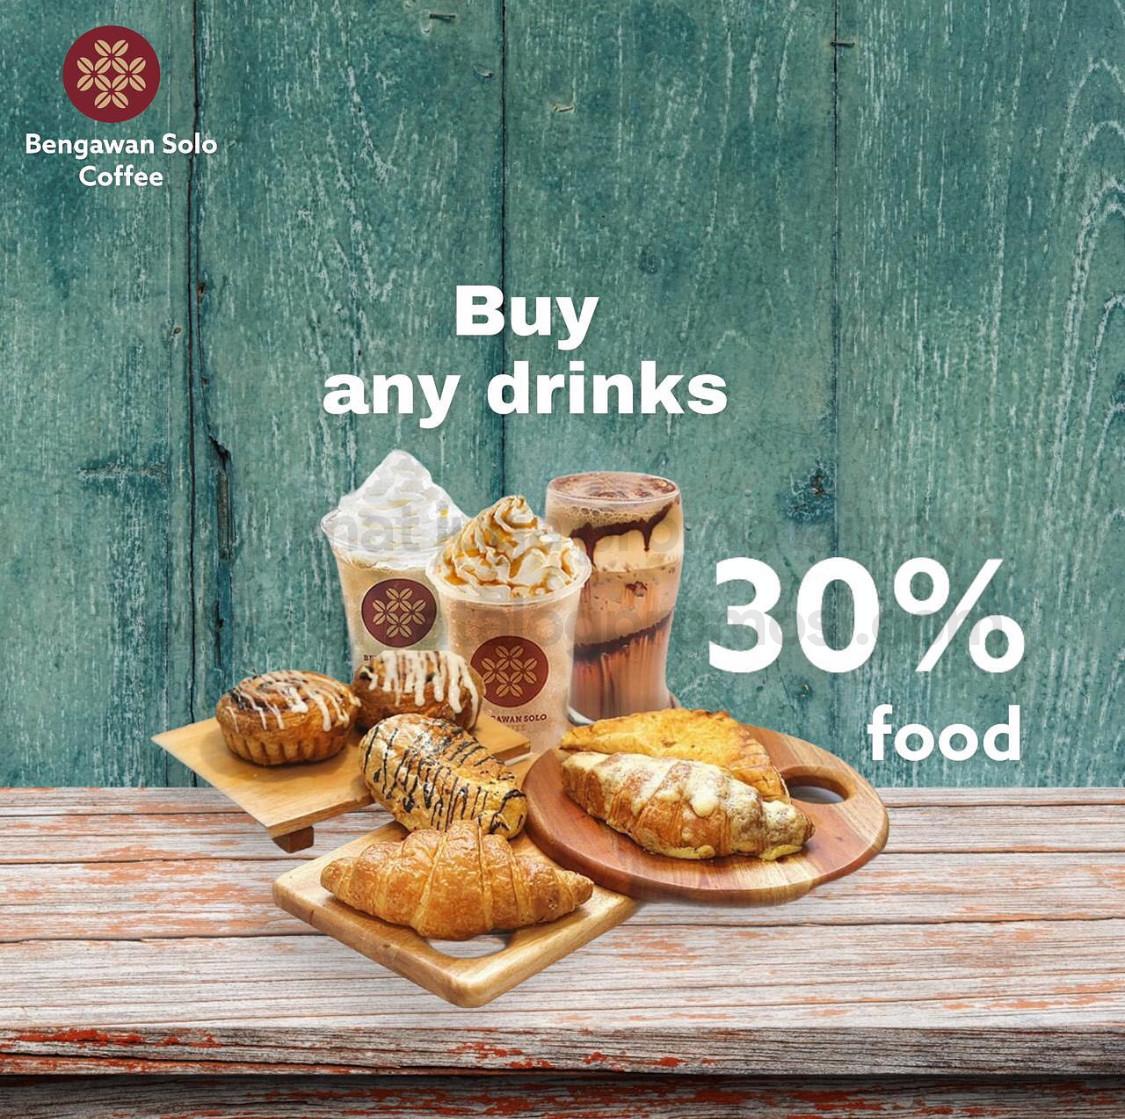 BENGAWAN SOLO COFFEE Promo DISKON 30% untuk makanan setiap pembelian MINUMAN